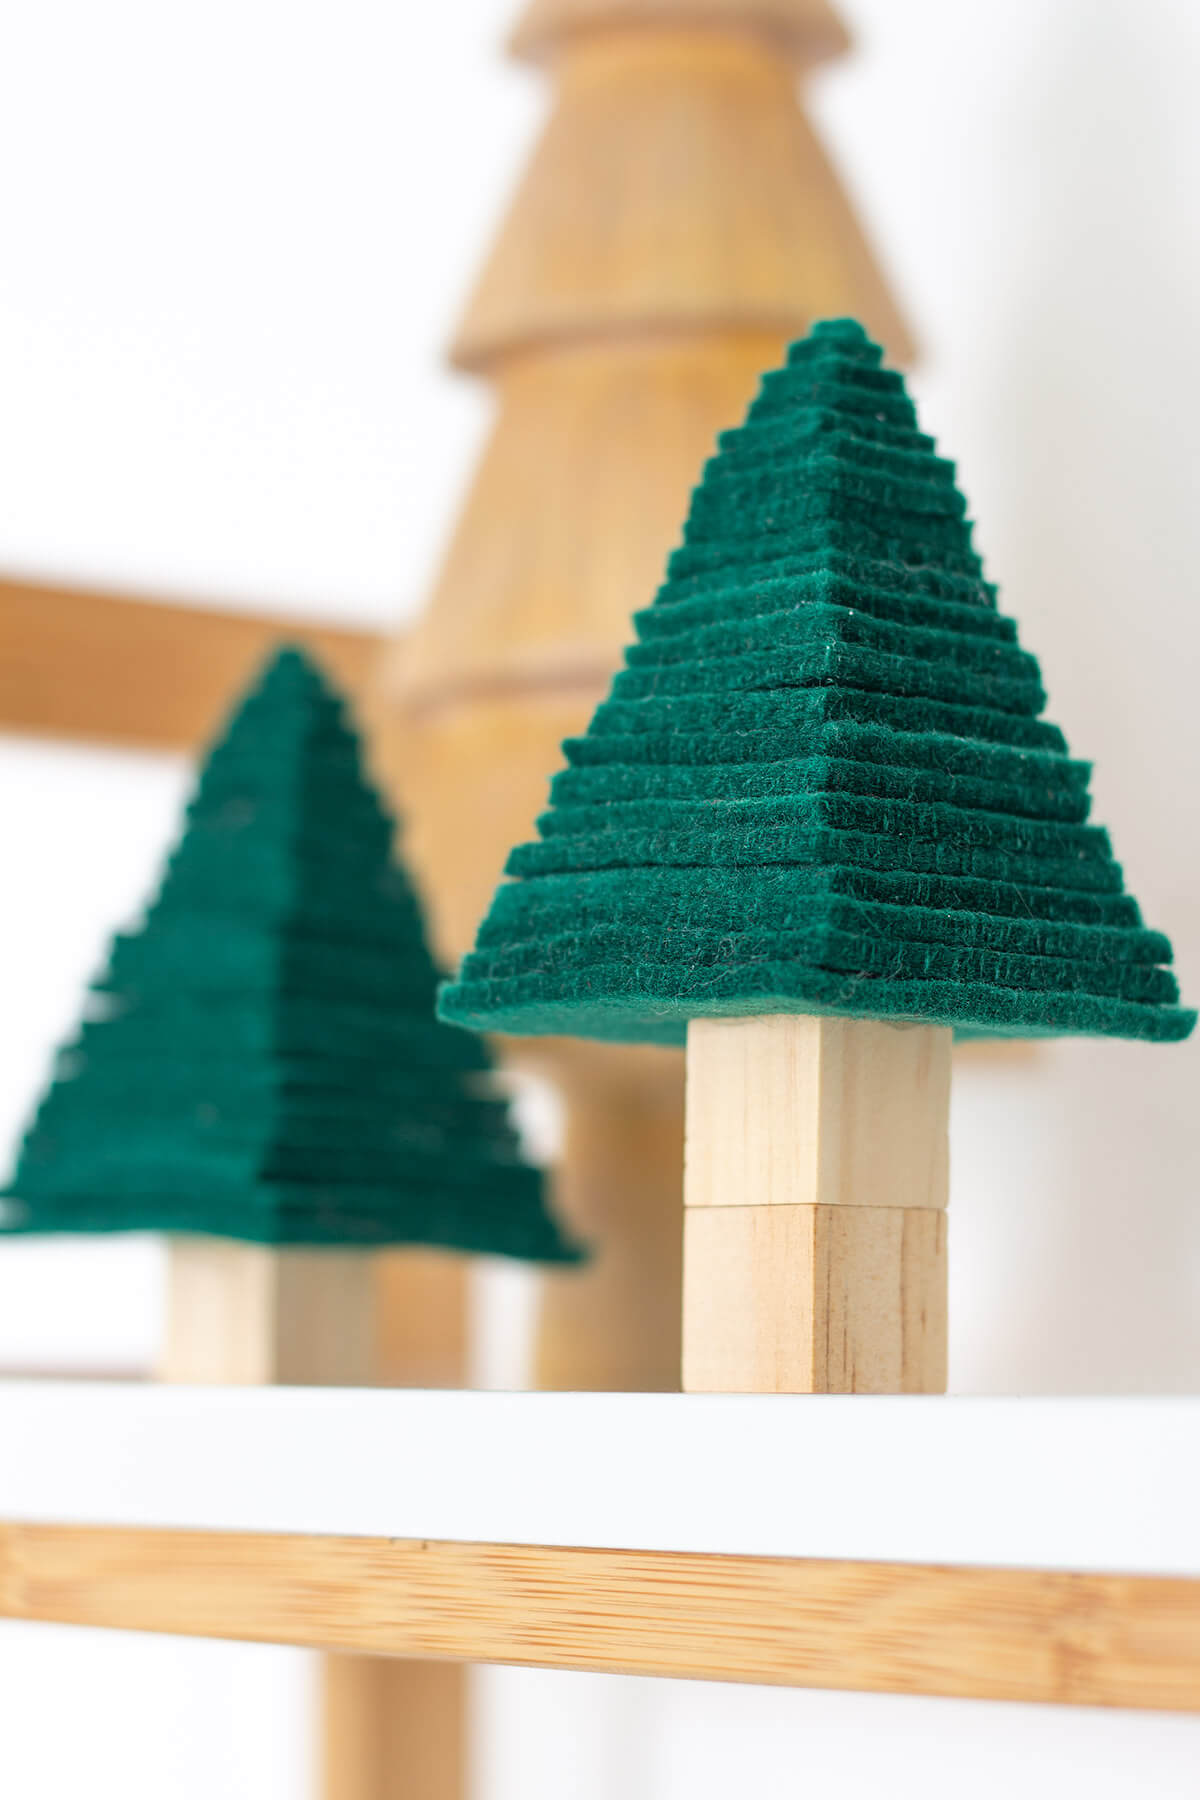 Diy Felt Christmas Tree Ornaments The Crafty Gentleman